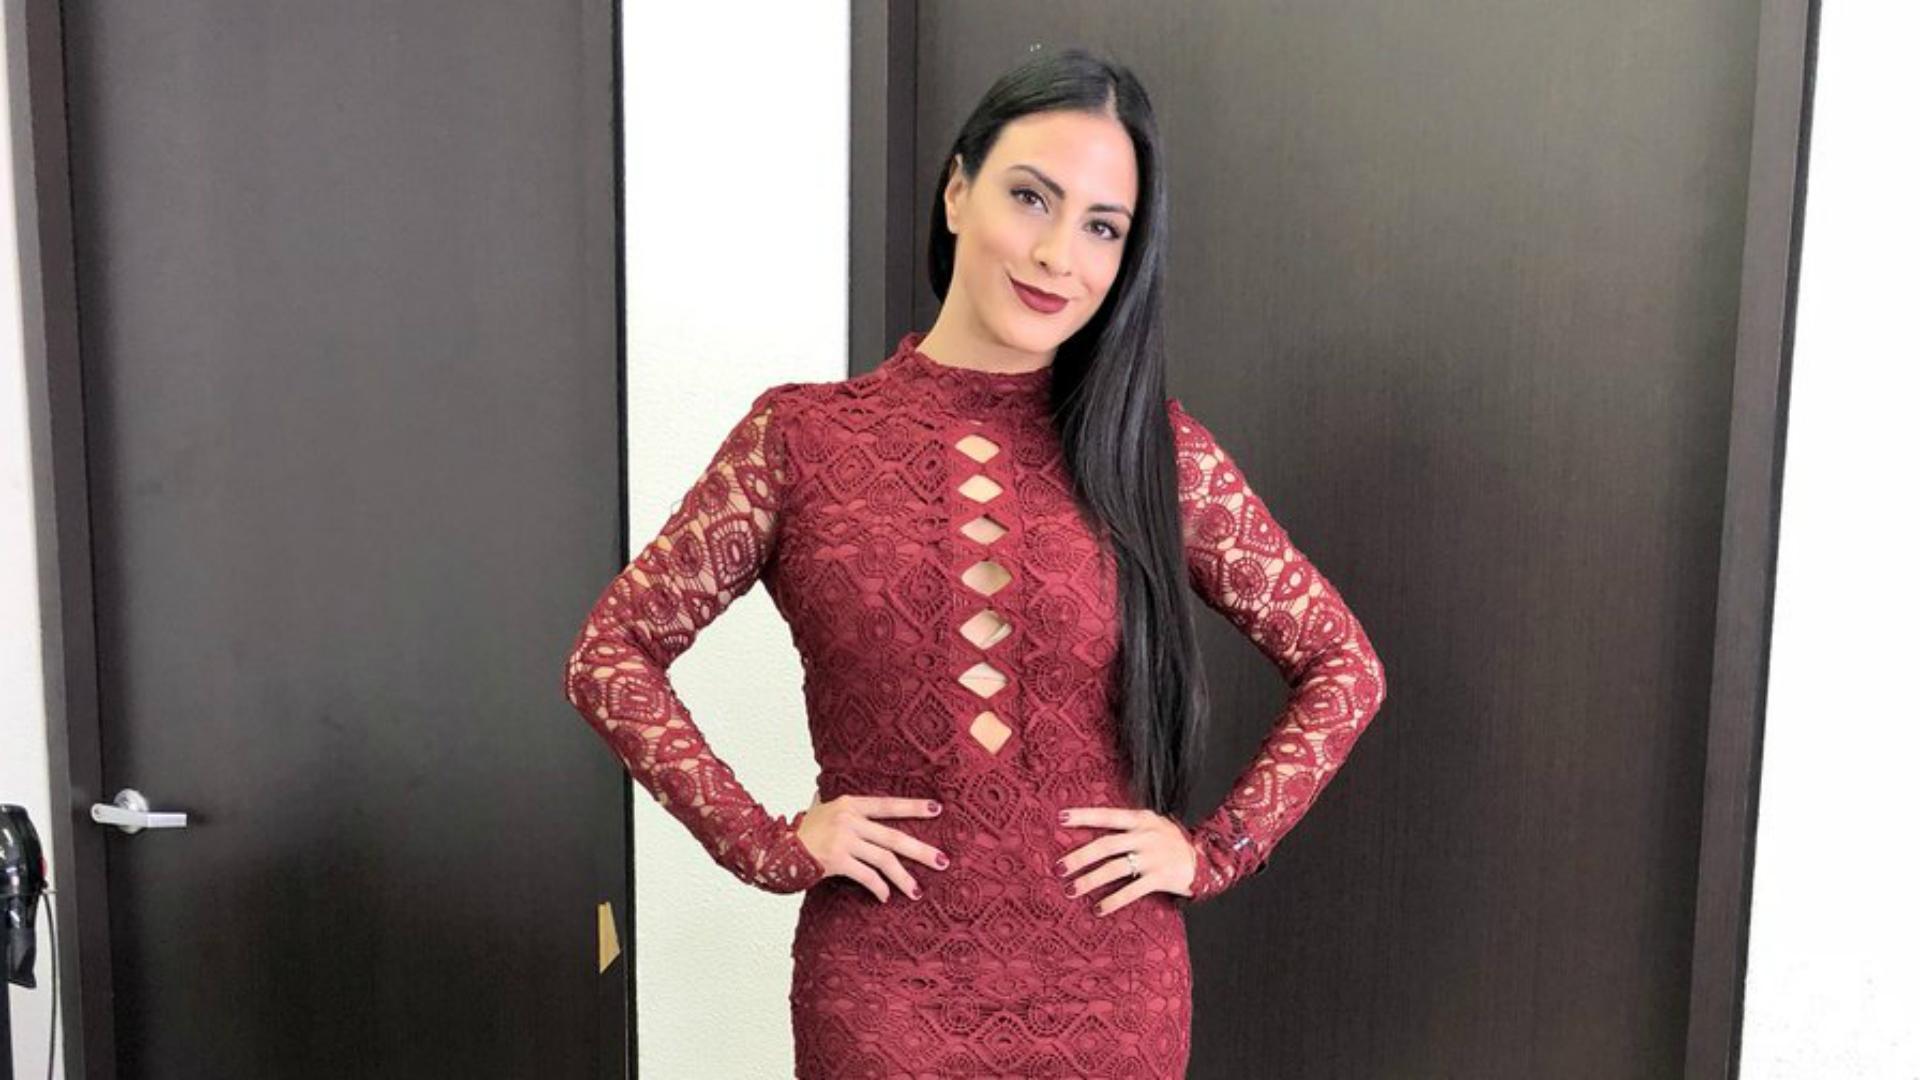 Valeria Marín